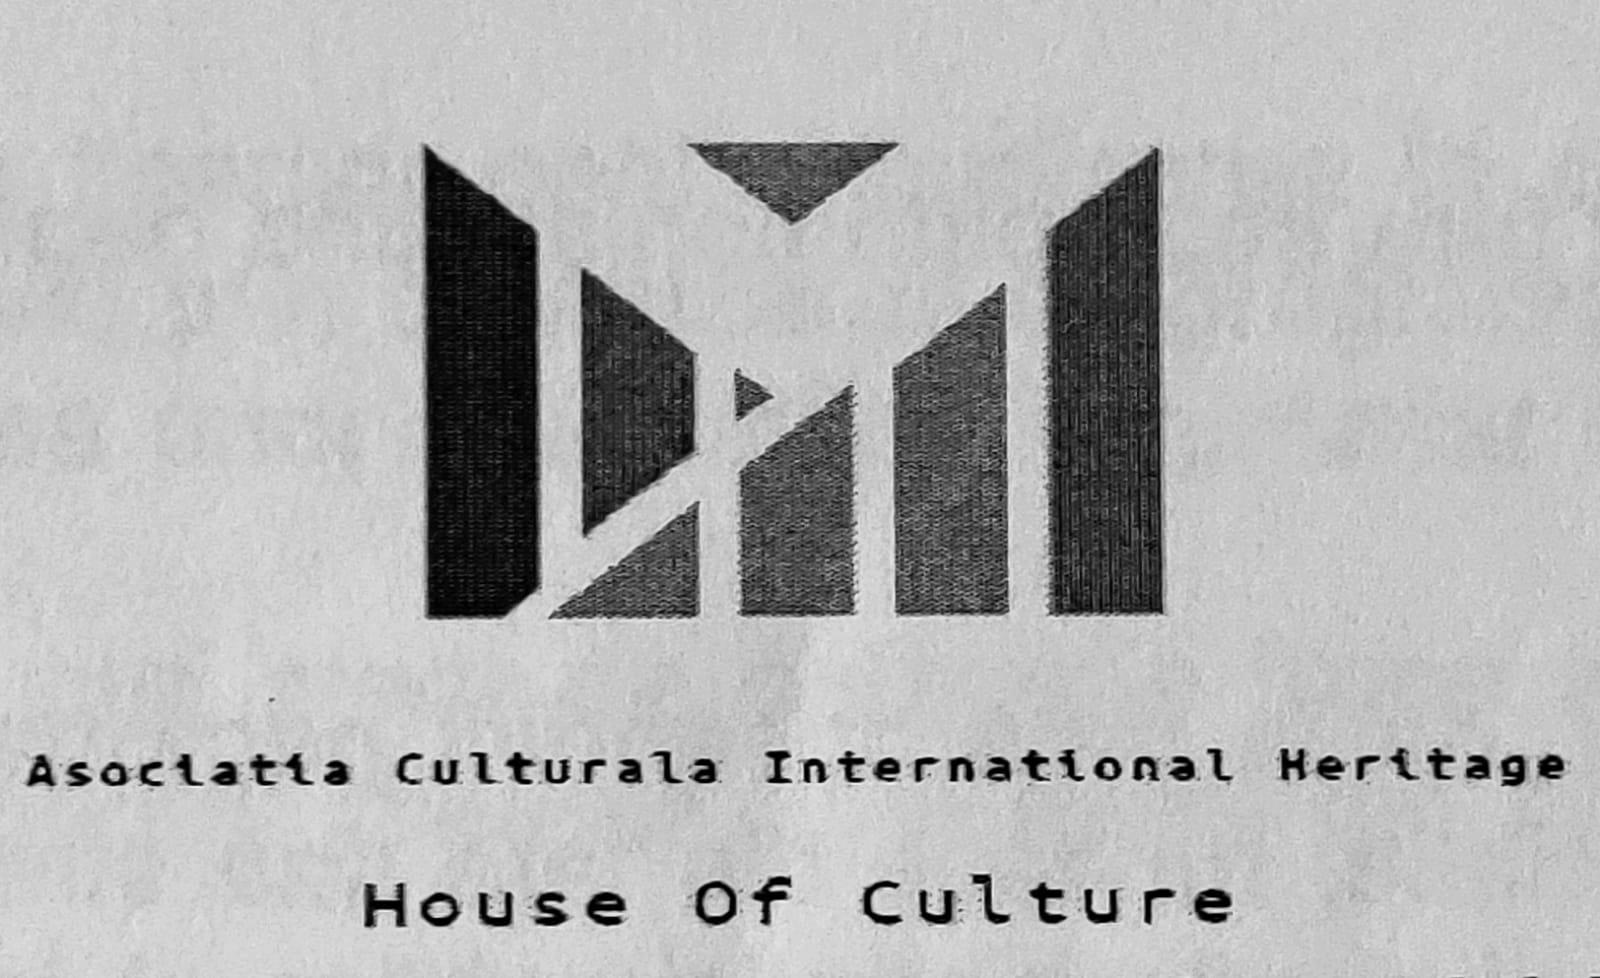 Asociatia Culturala International Heritage logo